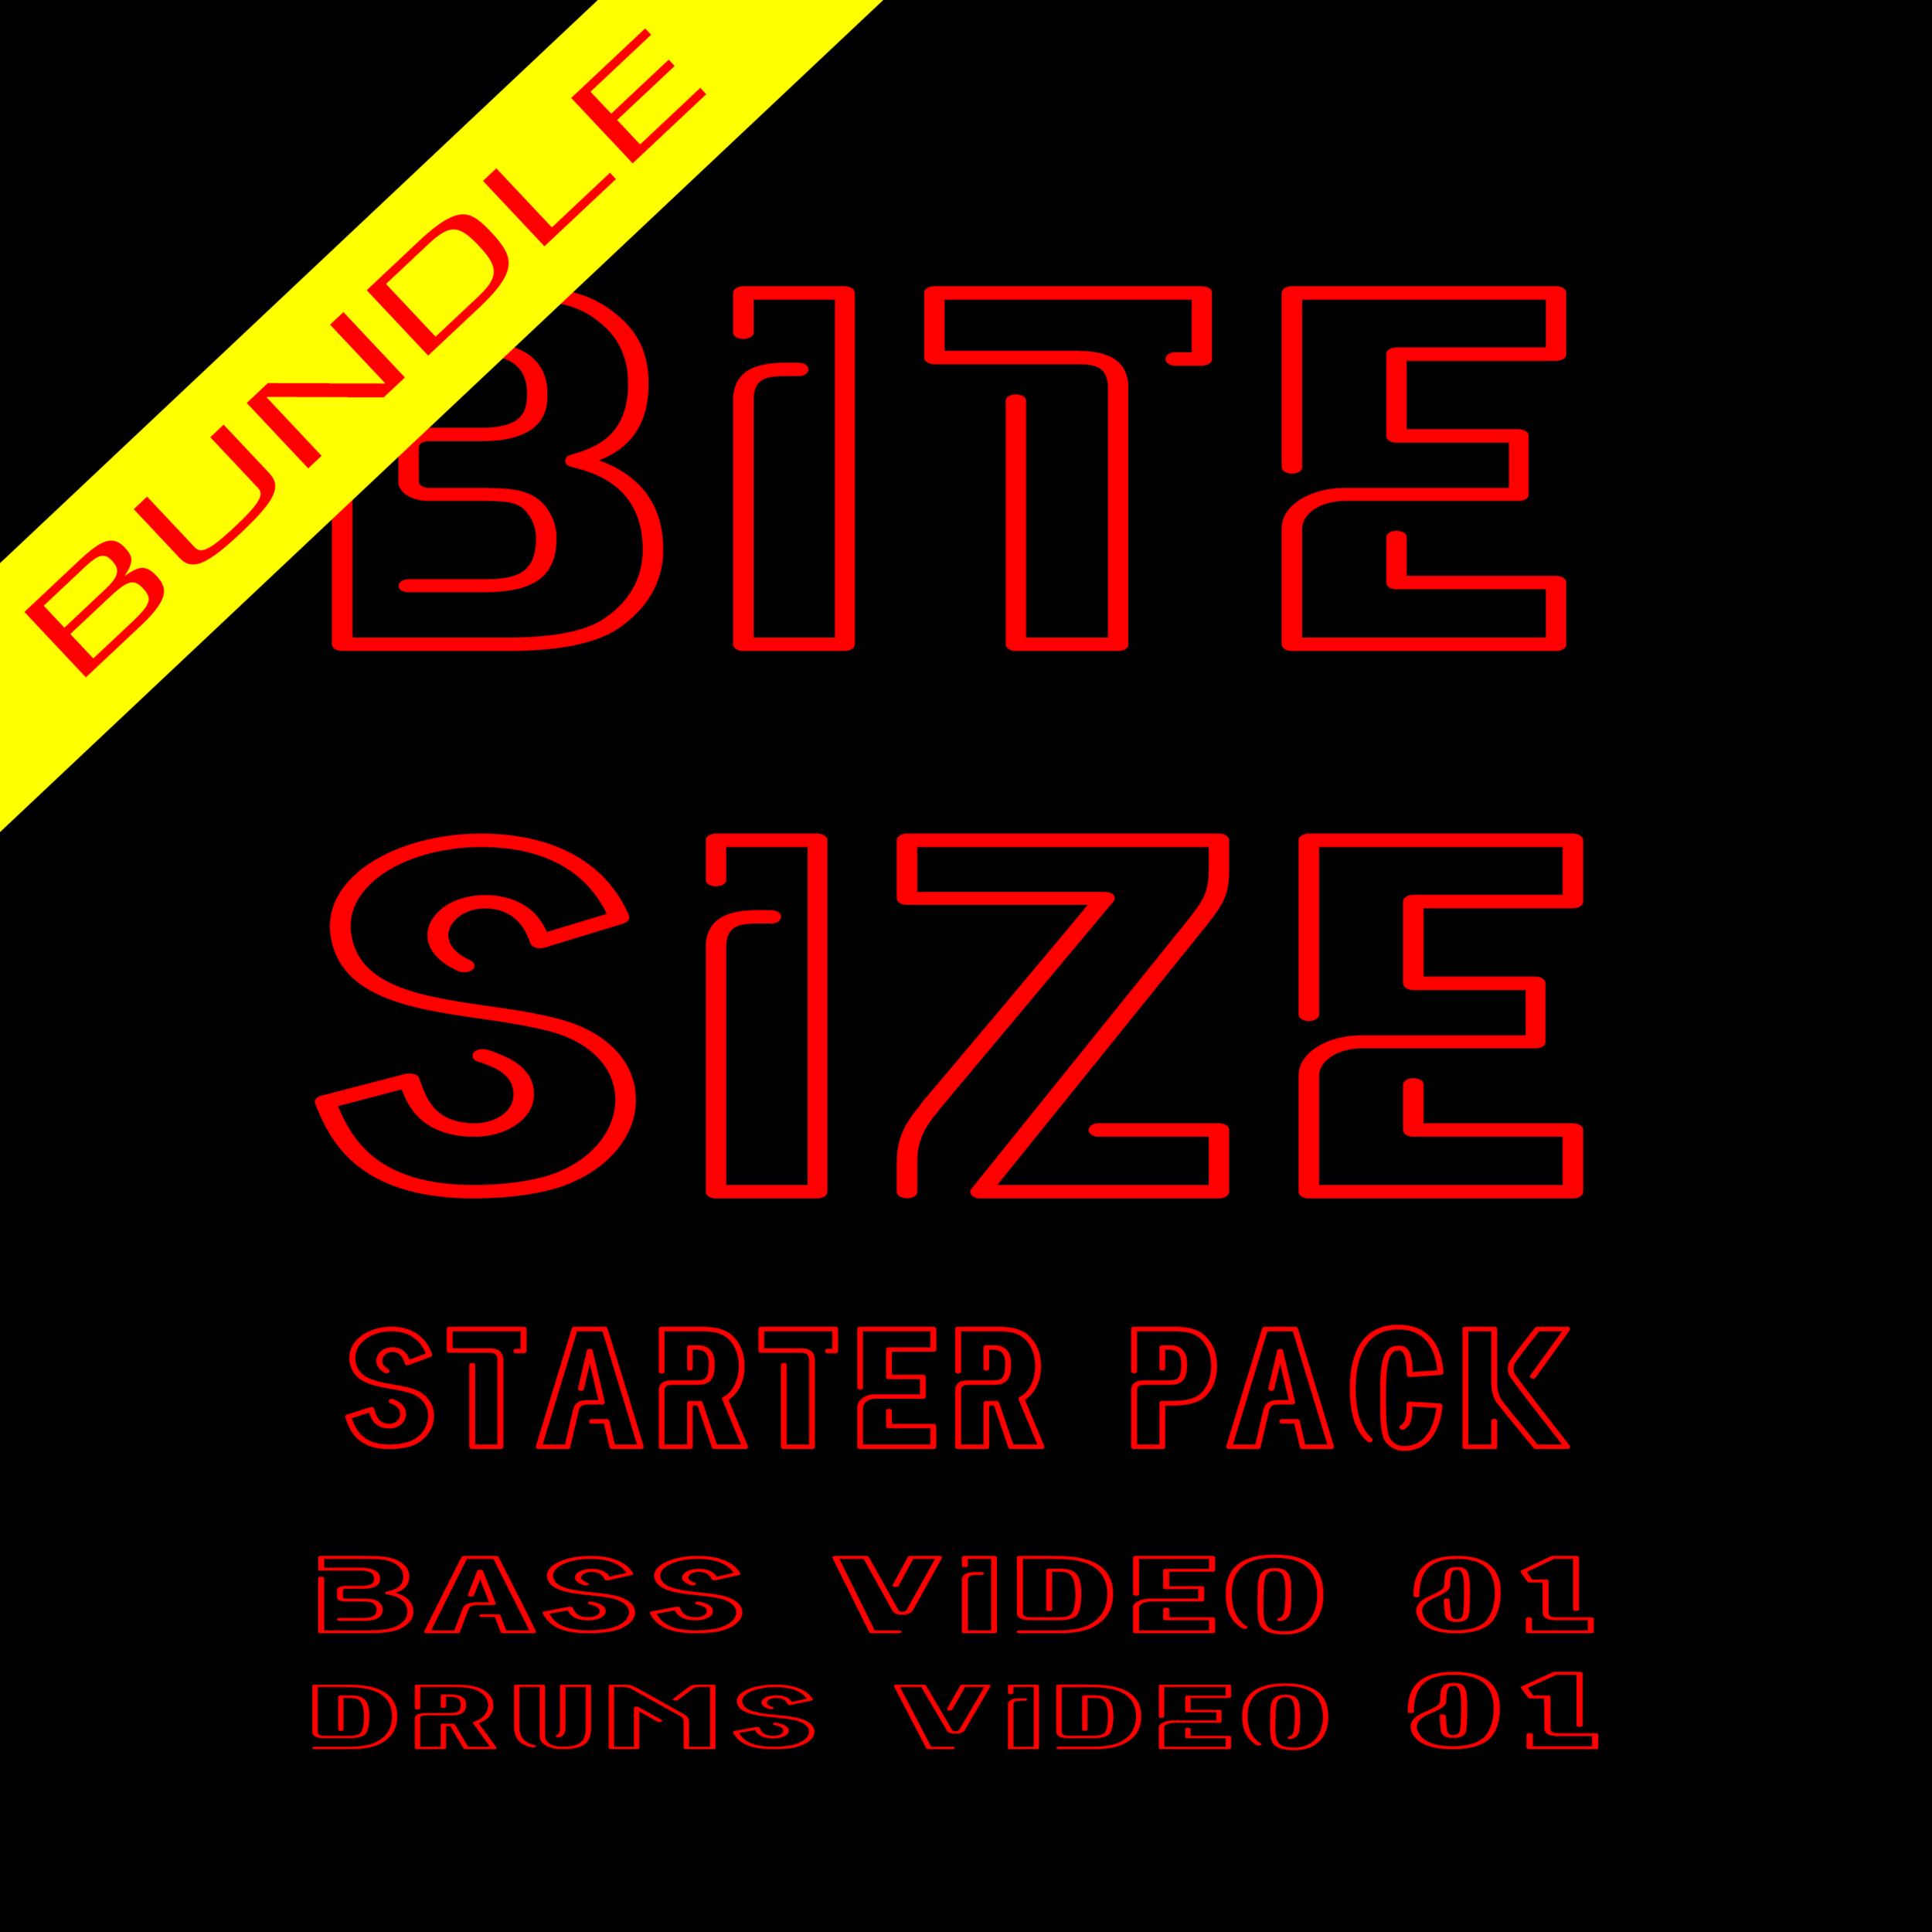 BITE SIZE STARTER PACK.png